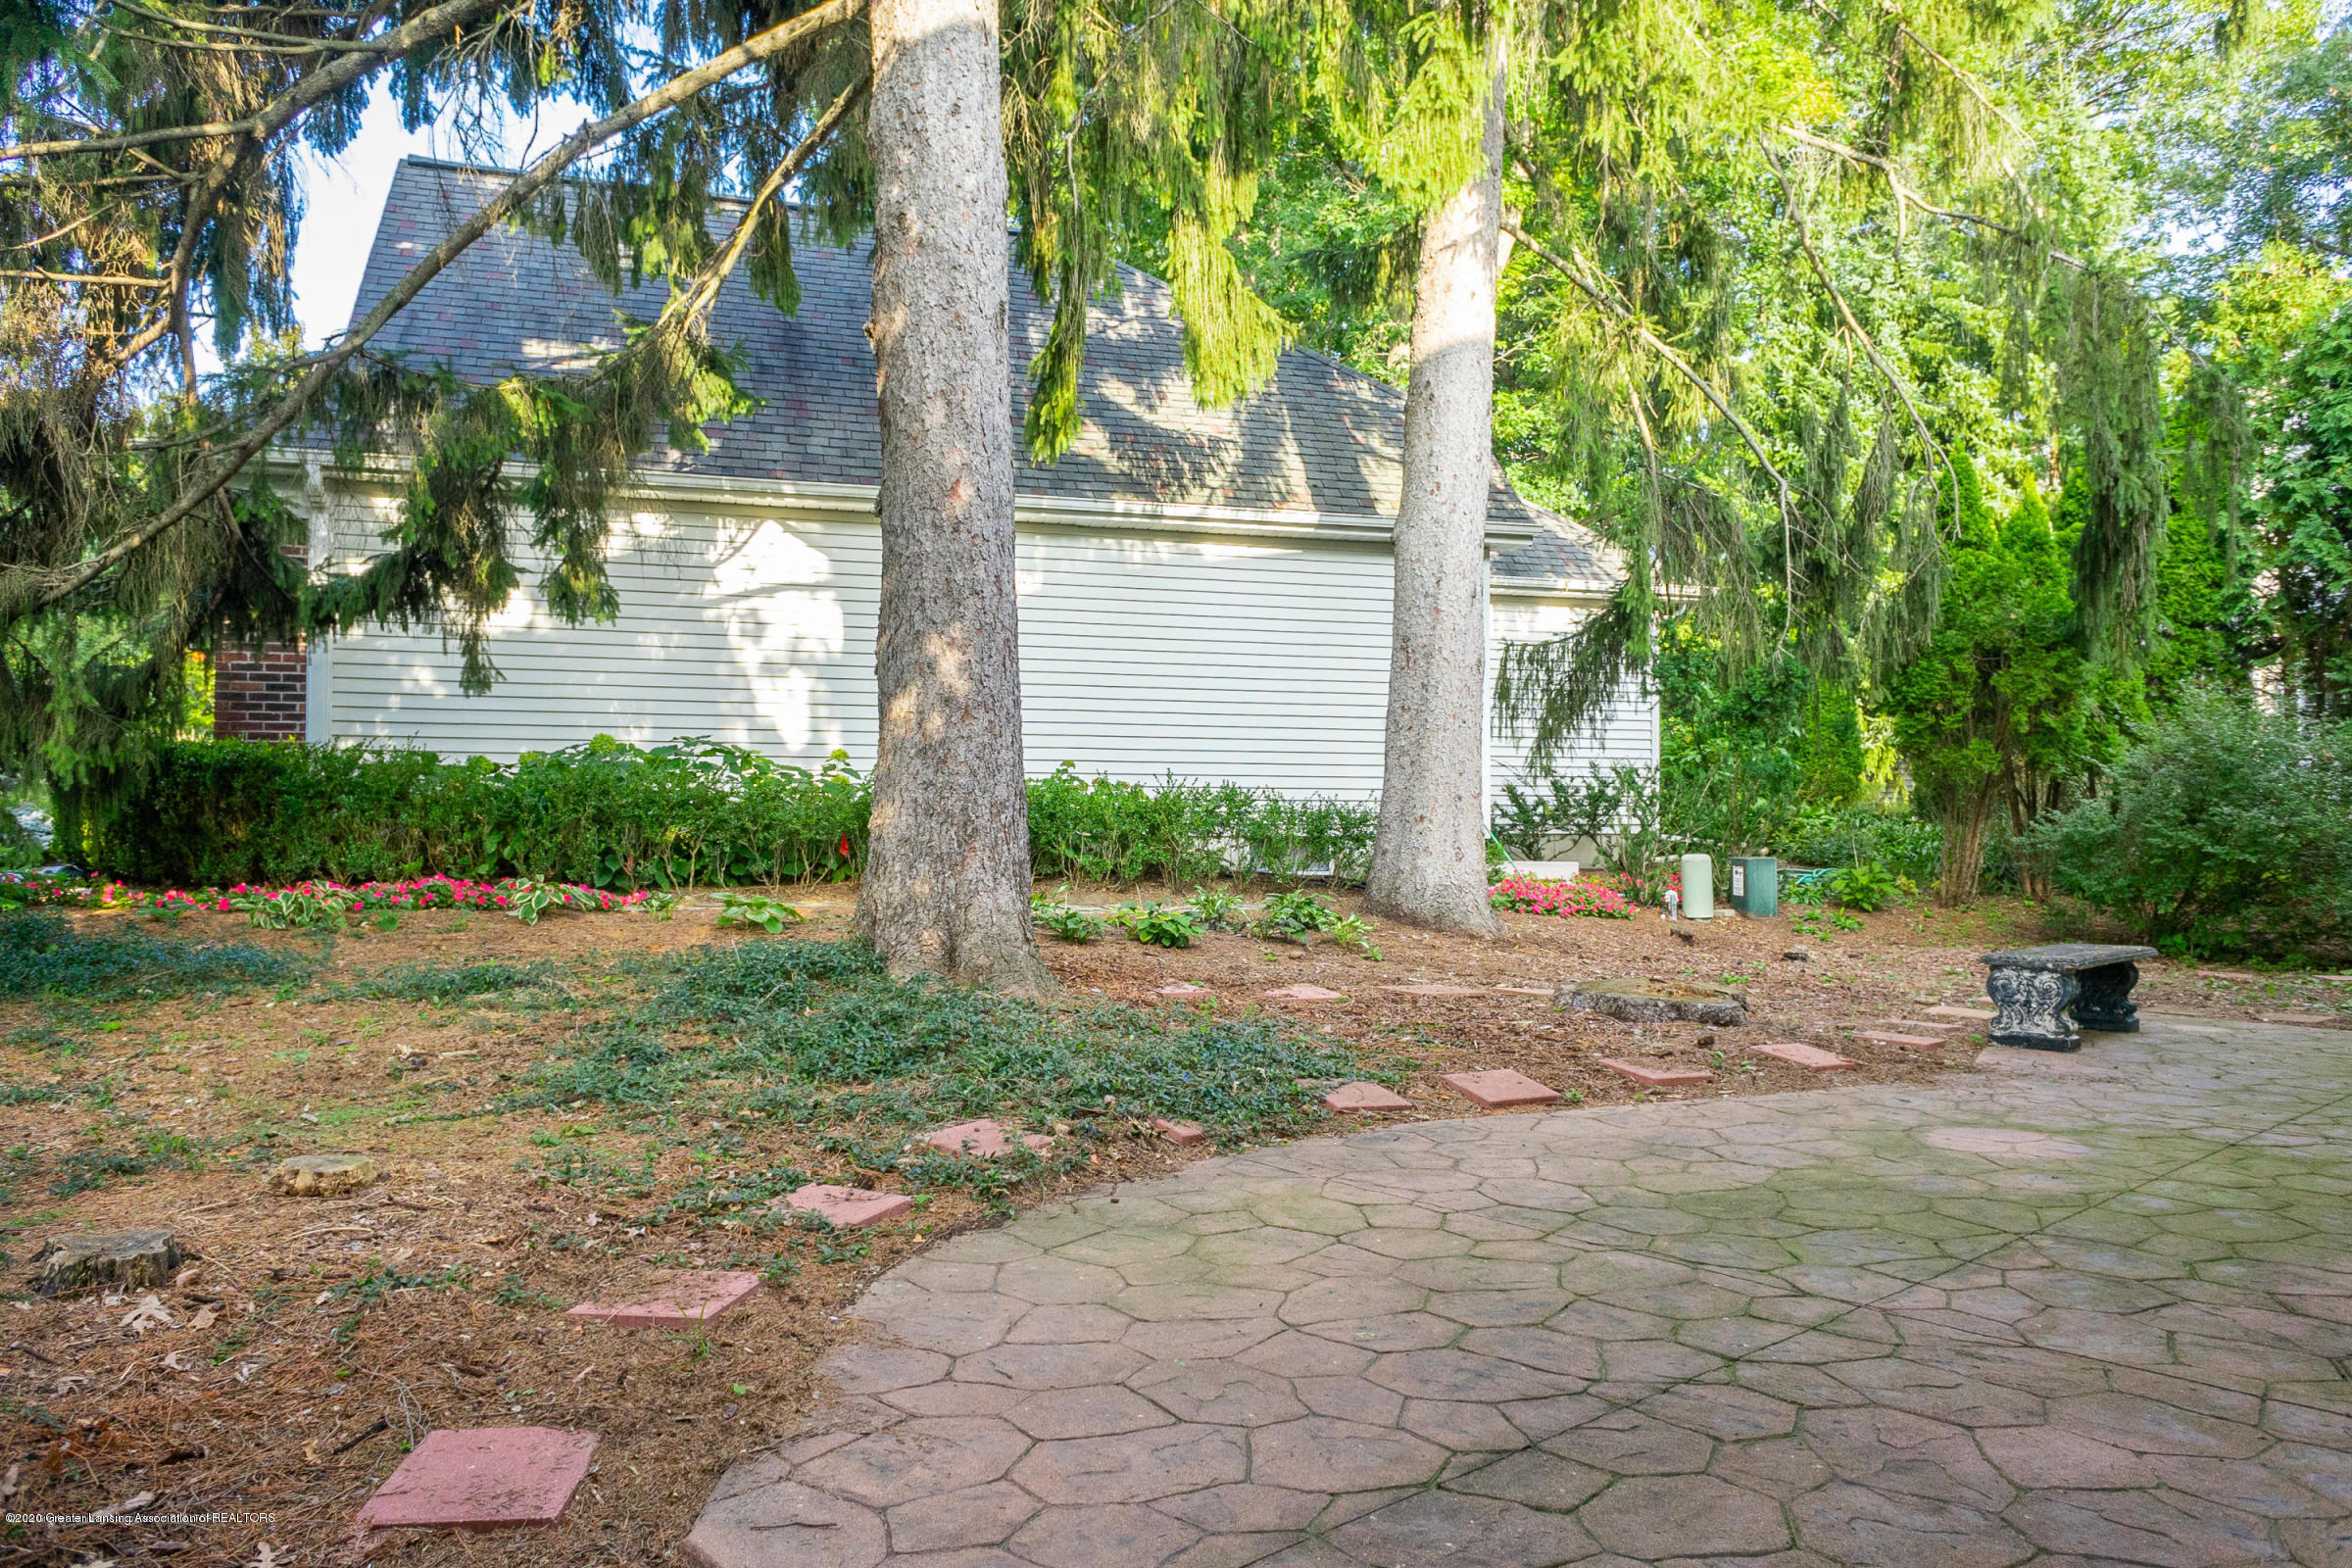 1593 Abbott Woods Terrace - 29 - 29